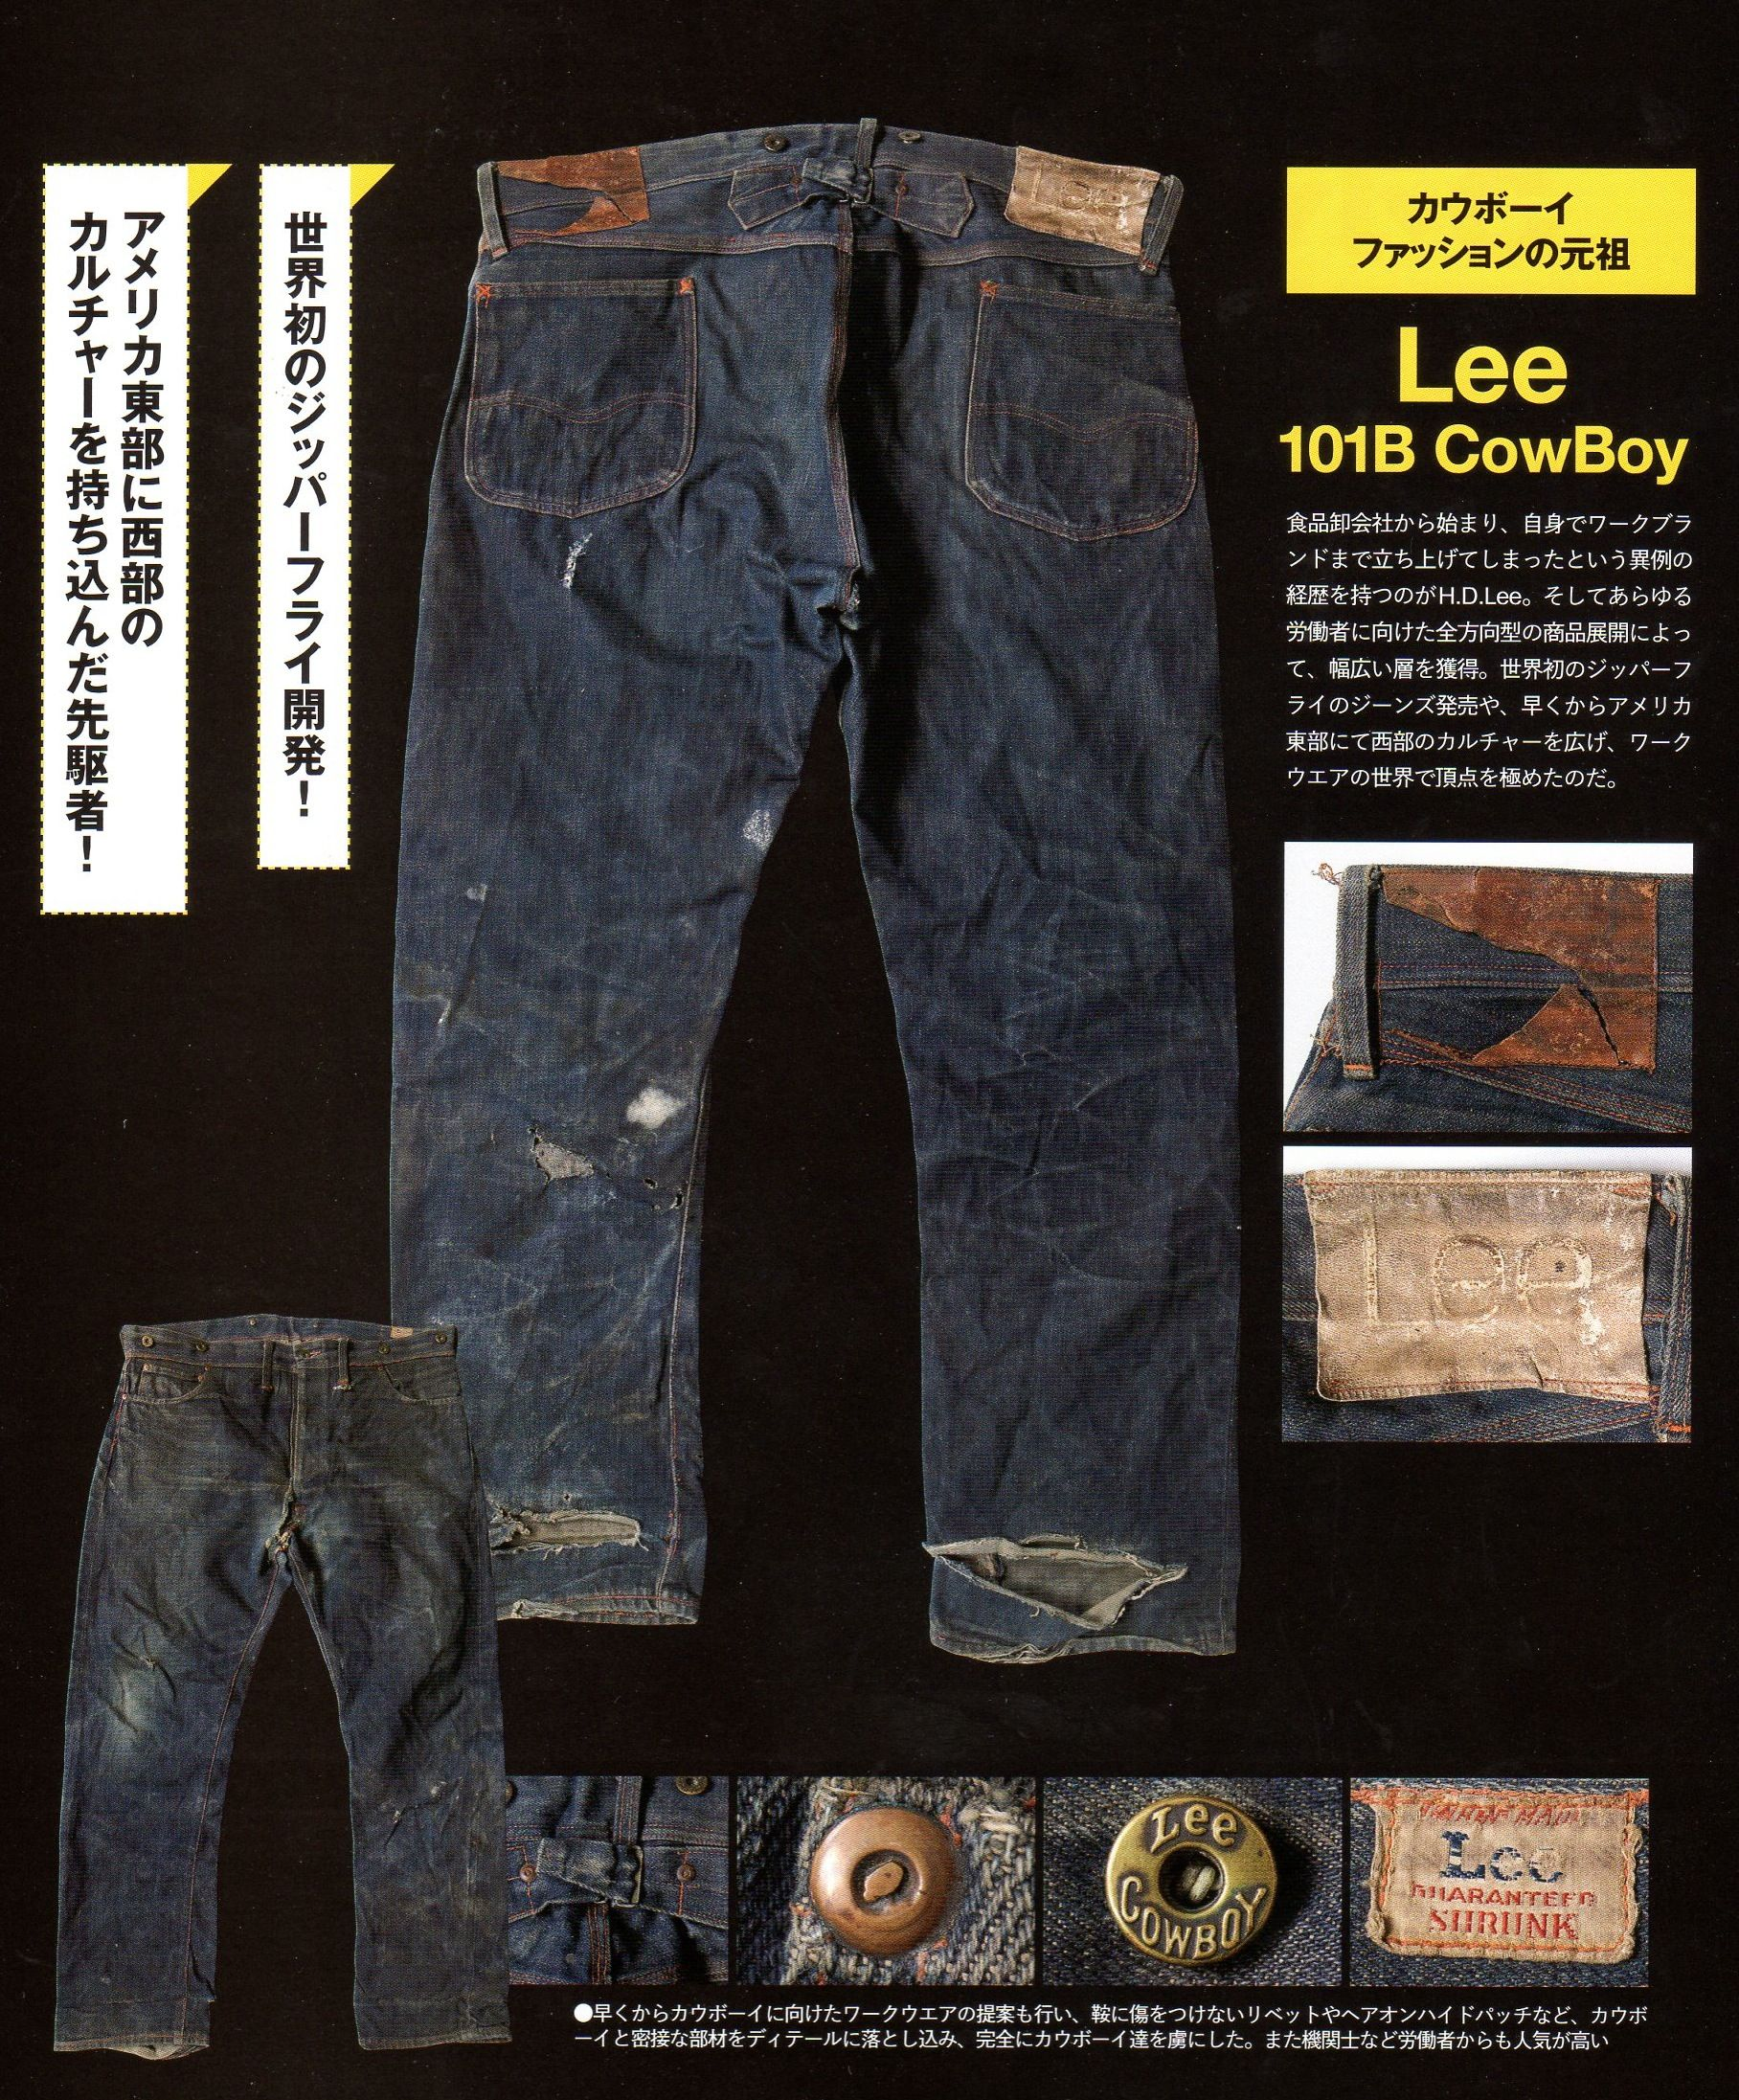 Lee Lot 101B Cowboy Pants, 1920's